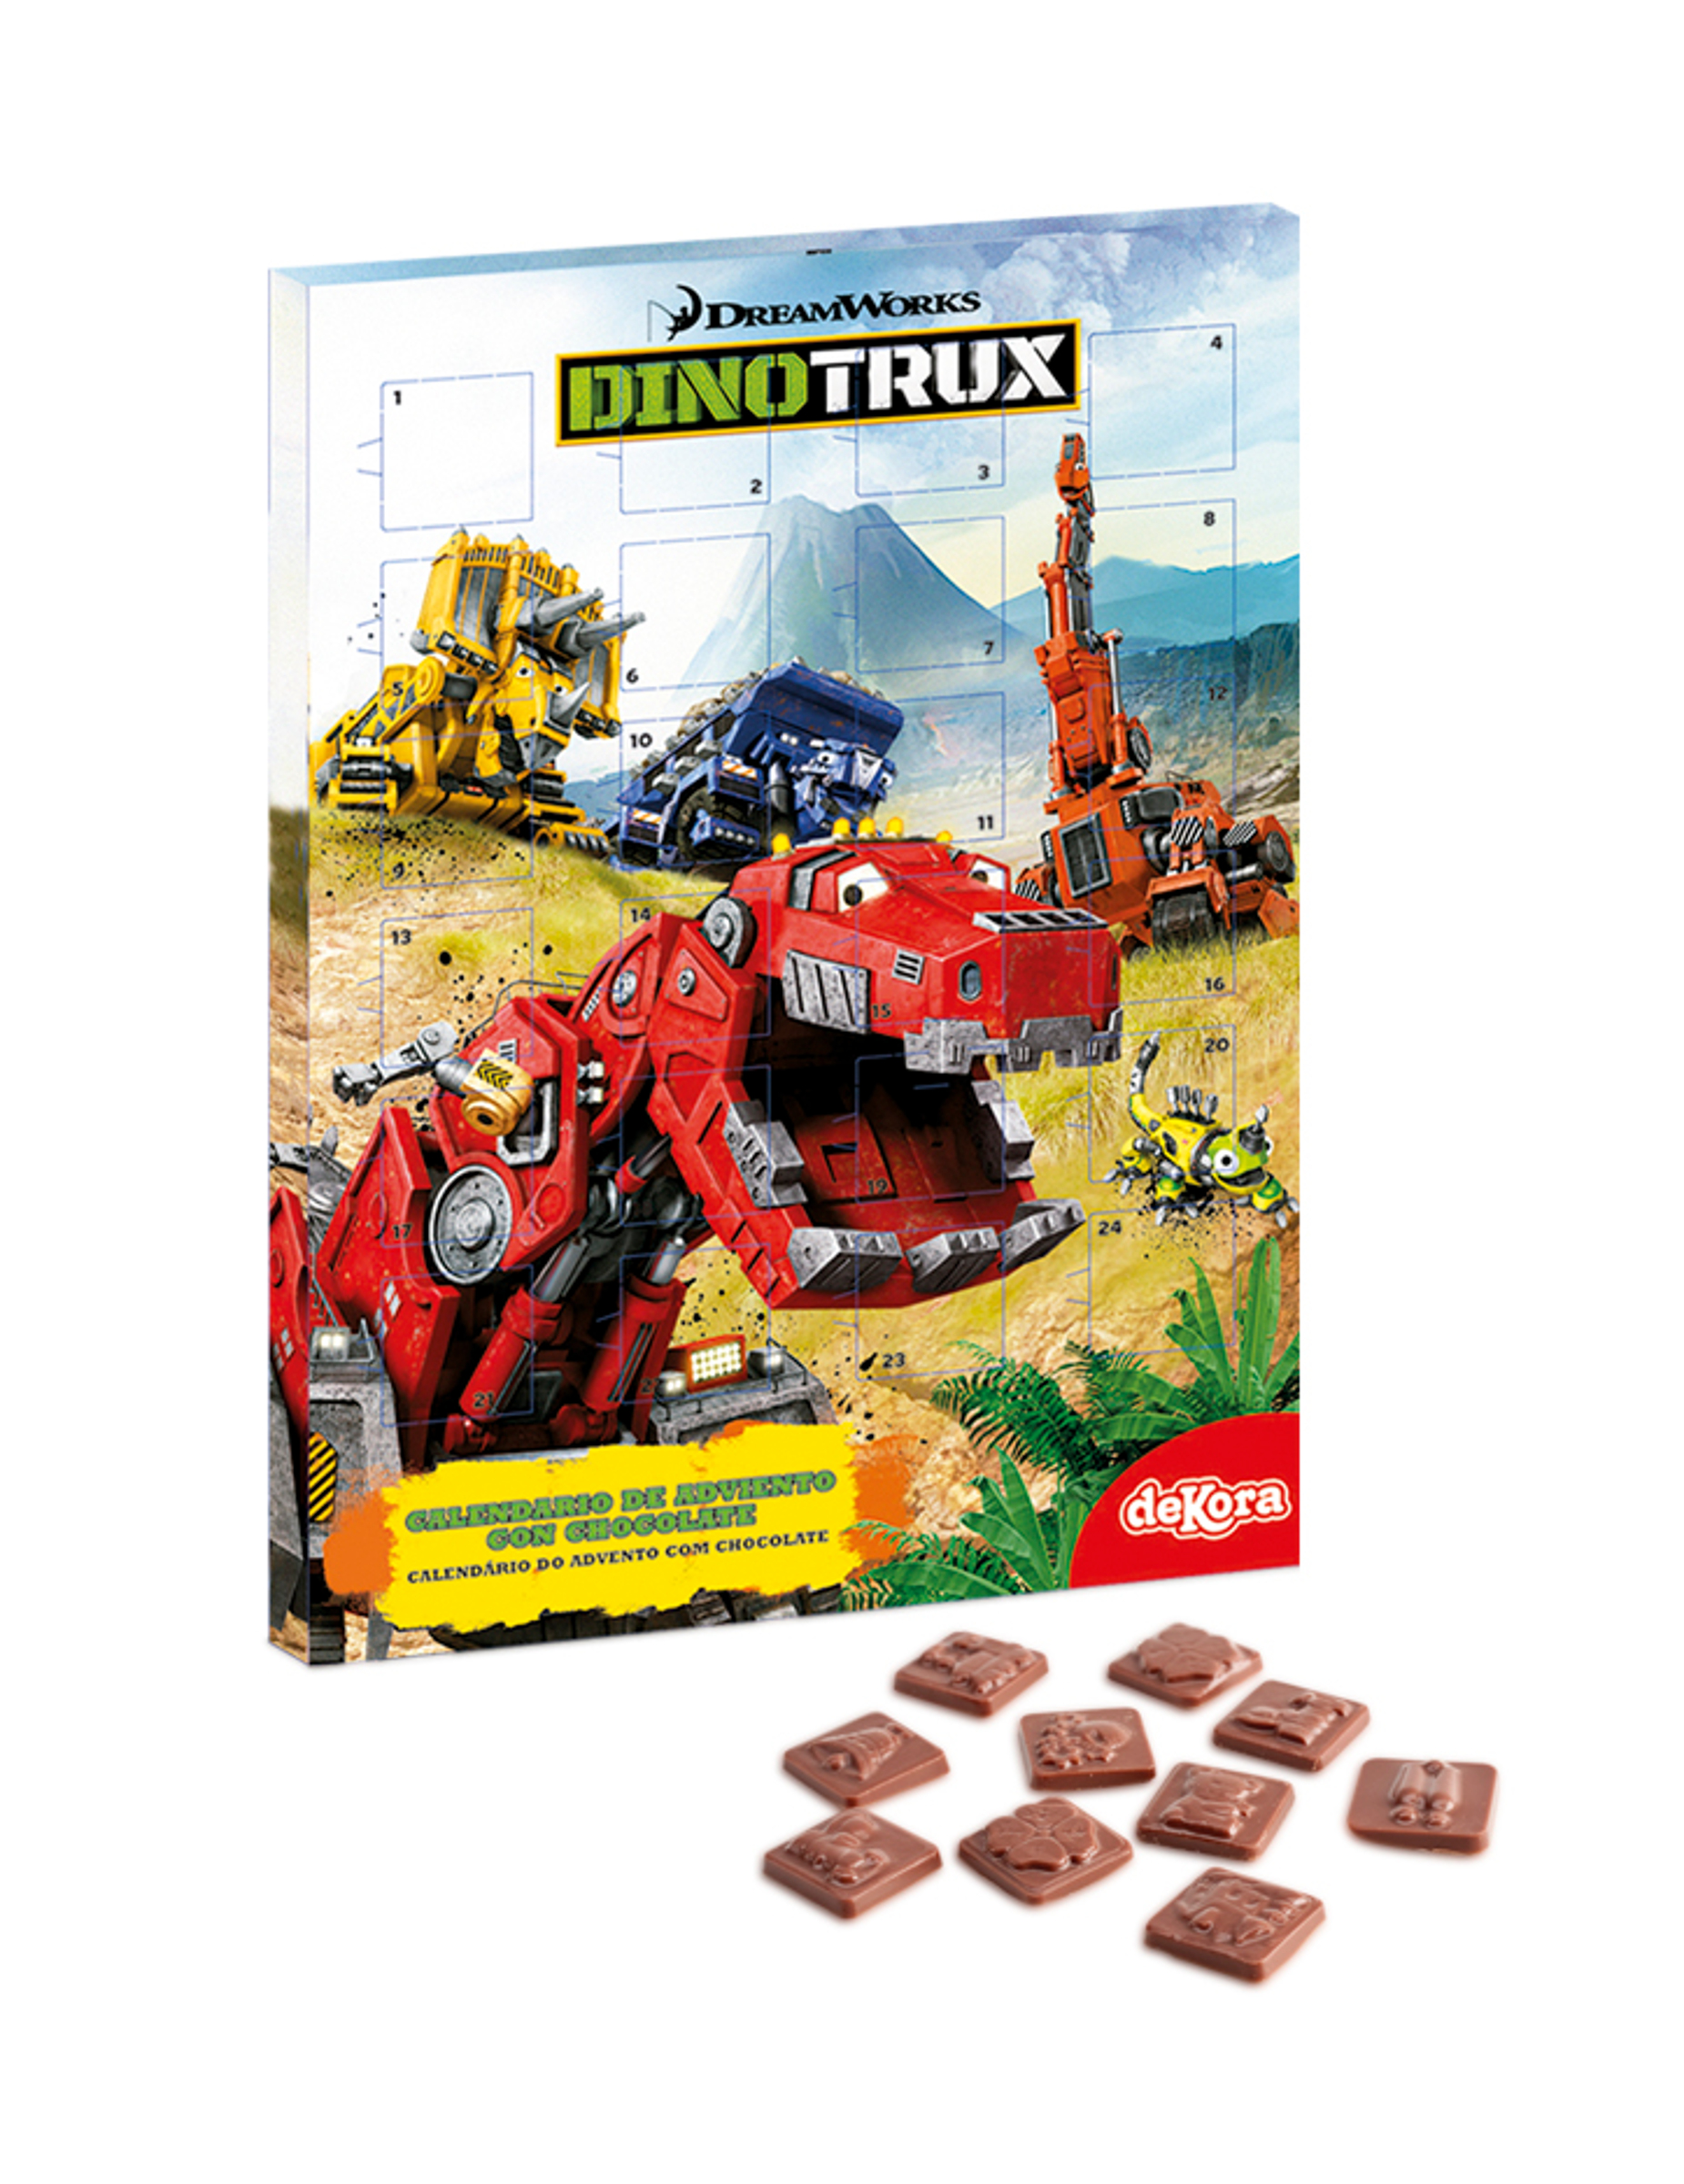 Calendario Dellavvento Con Cioccolatini Dinotrux Su Vegaooparty